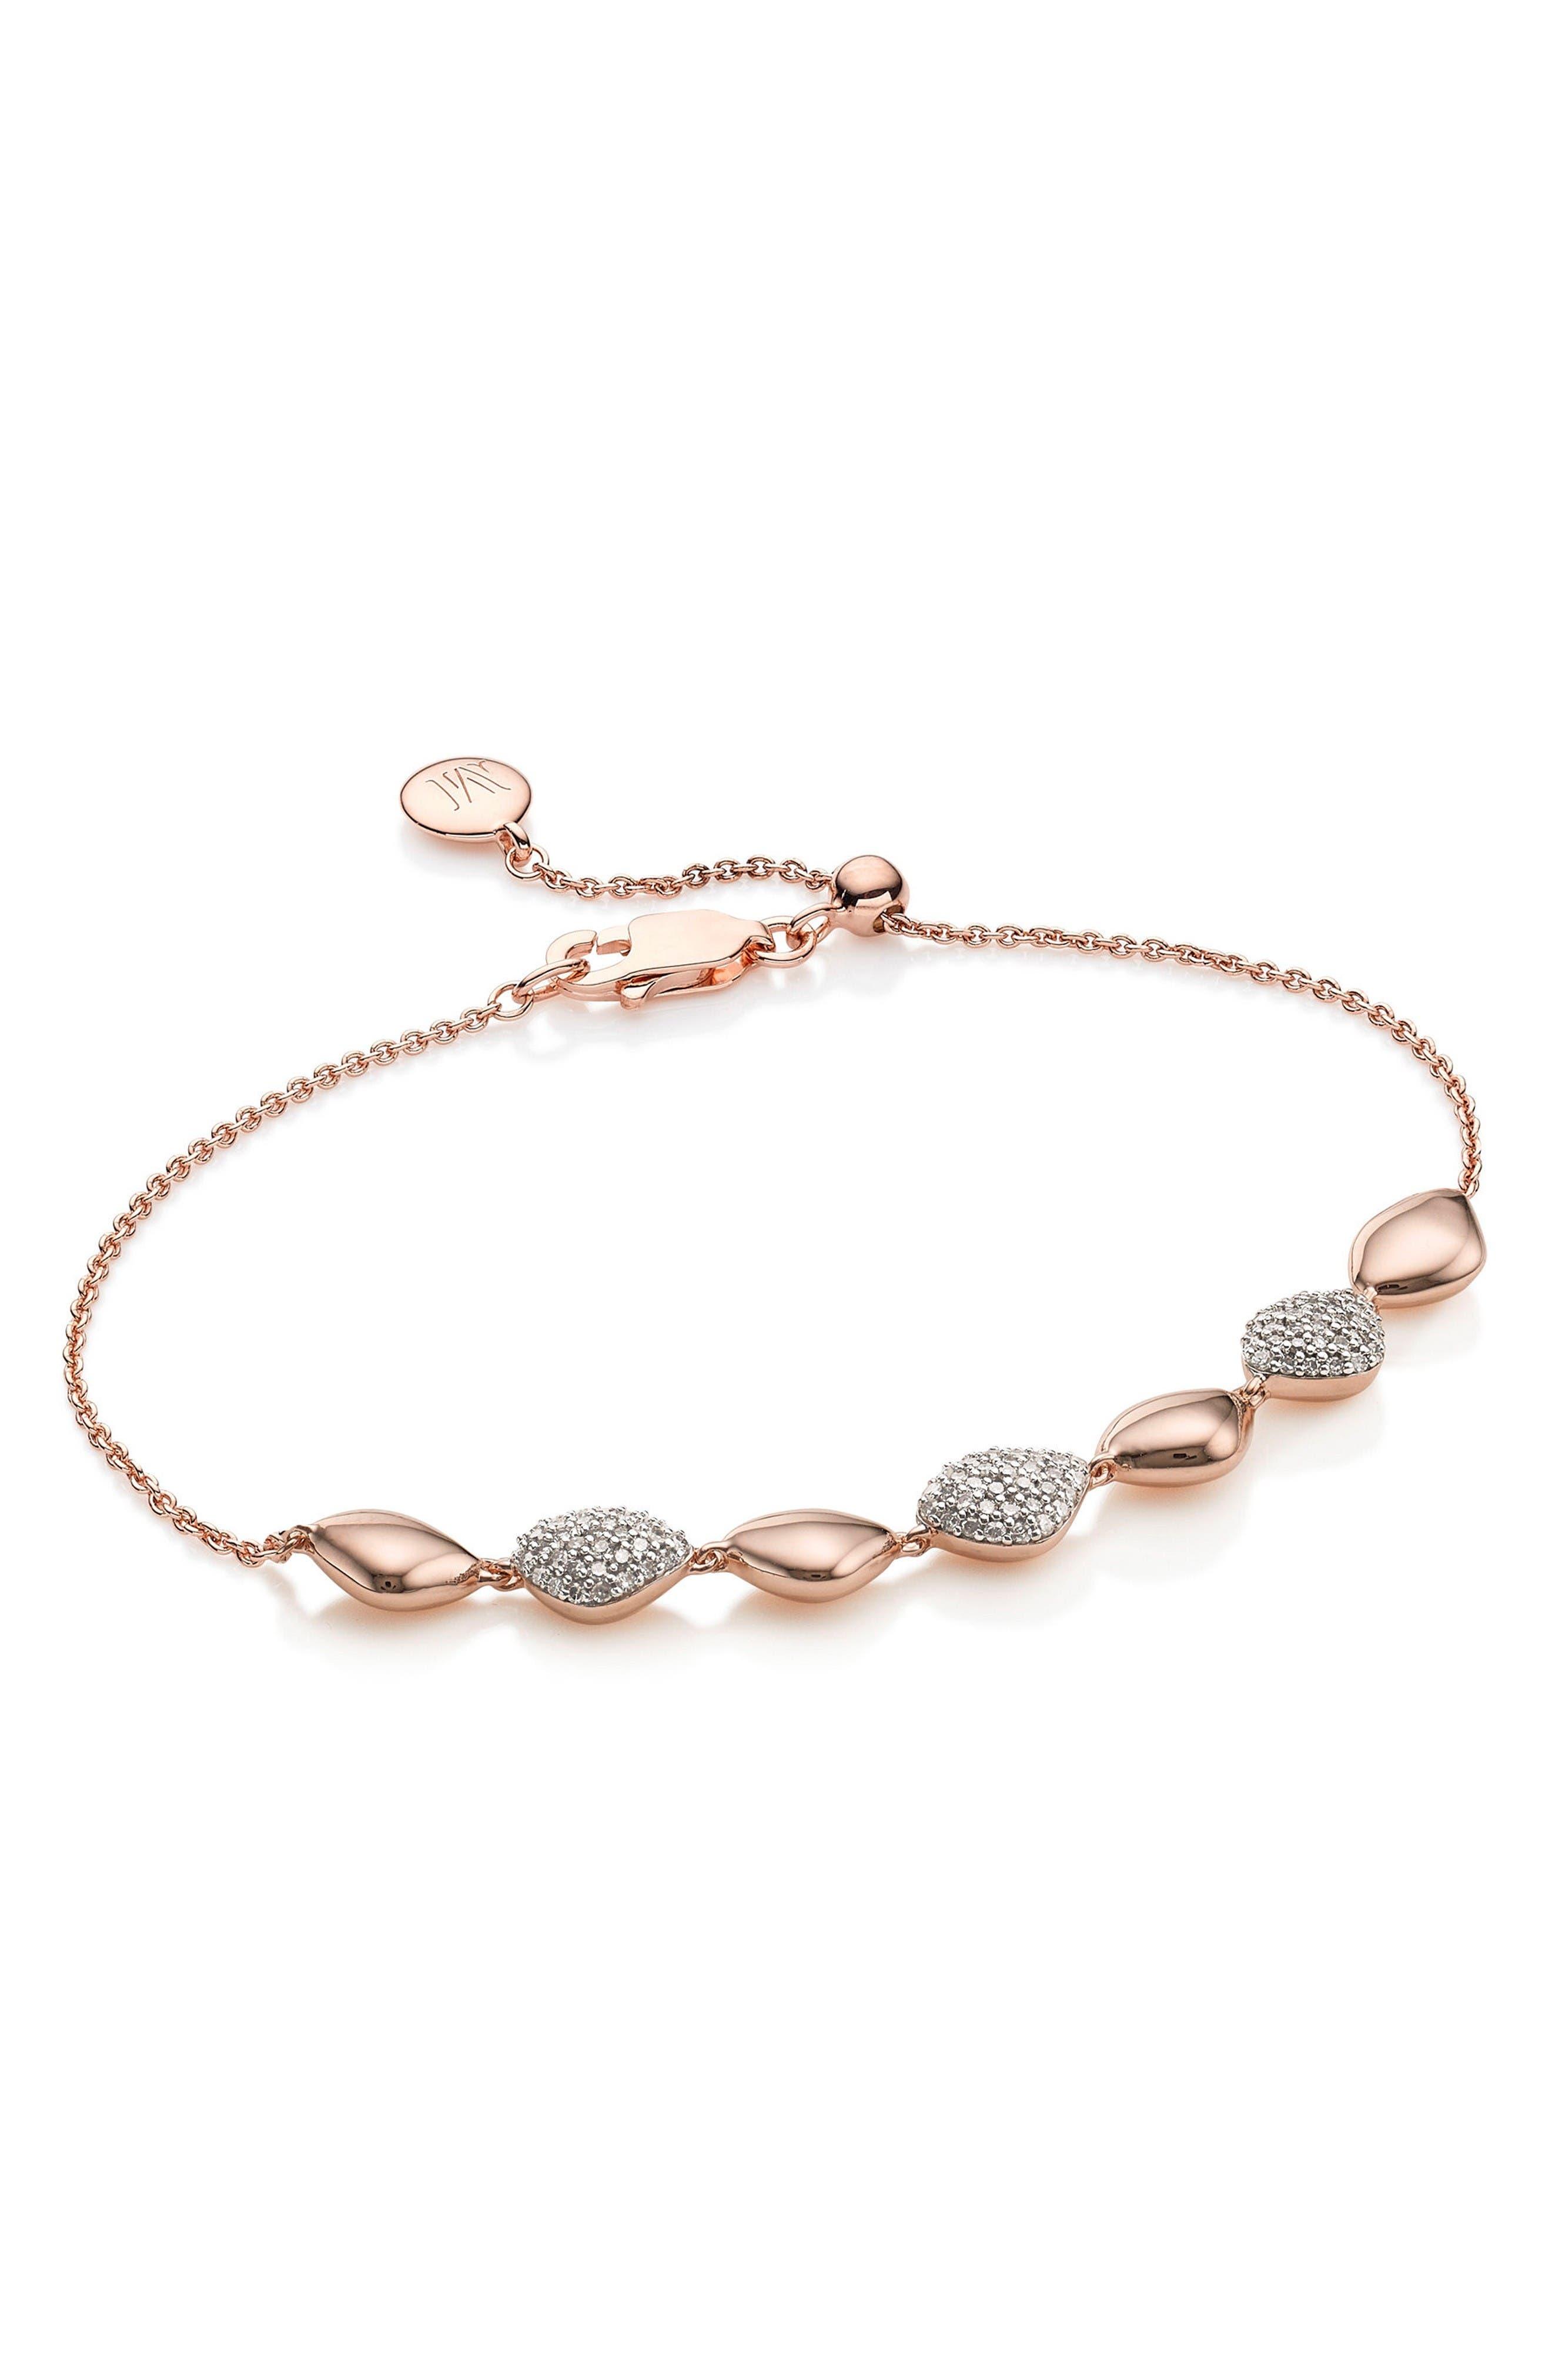 Main Image - Monica Vinader Nura Teardrop Diamond Bracelet